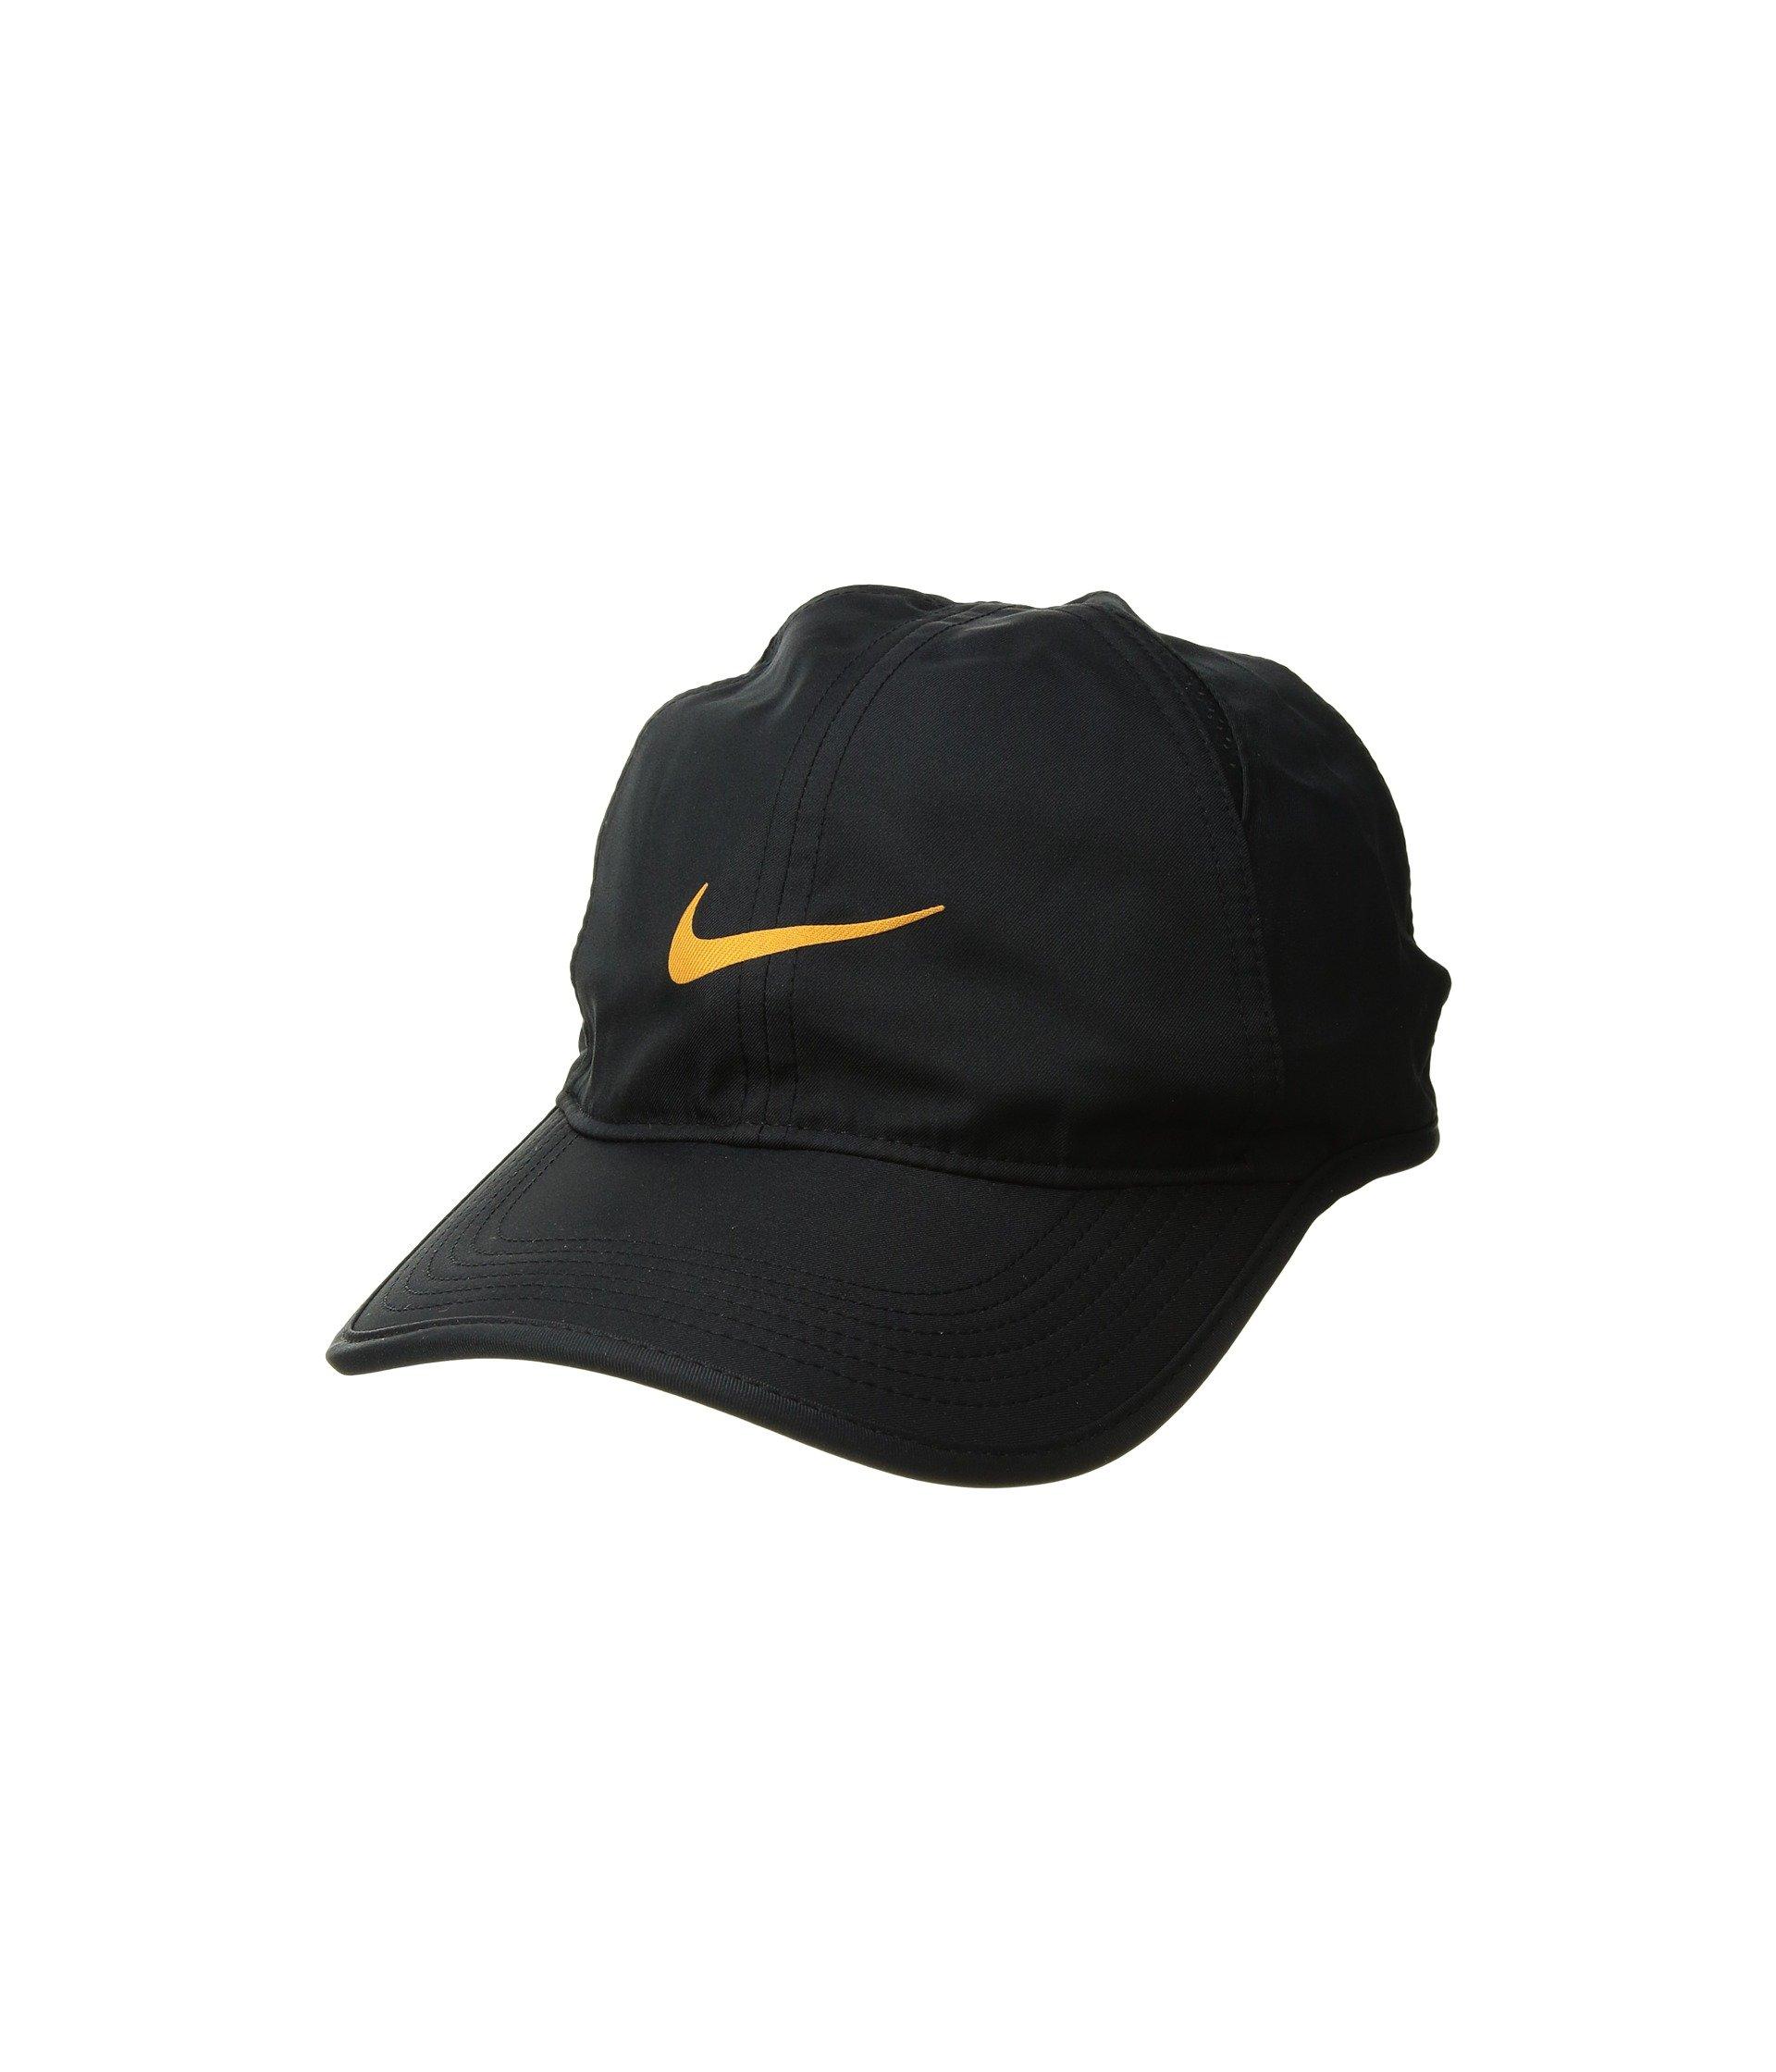 Nike Unisex Court AeroBill Featherlight Tennis Adjustable Cap Black/Black/Orange Peel (ONE Size) by NIKE (Image #1)